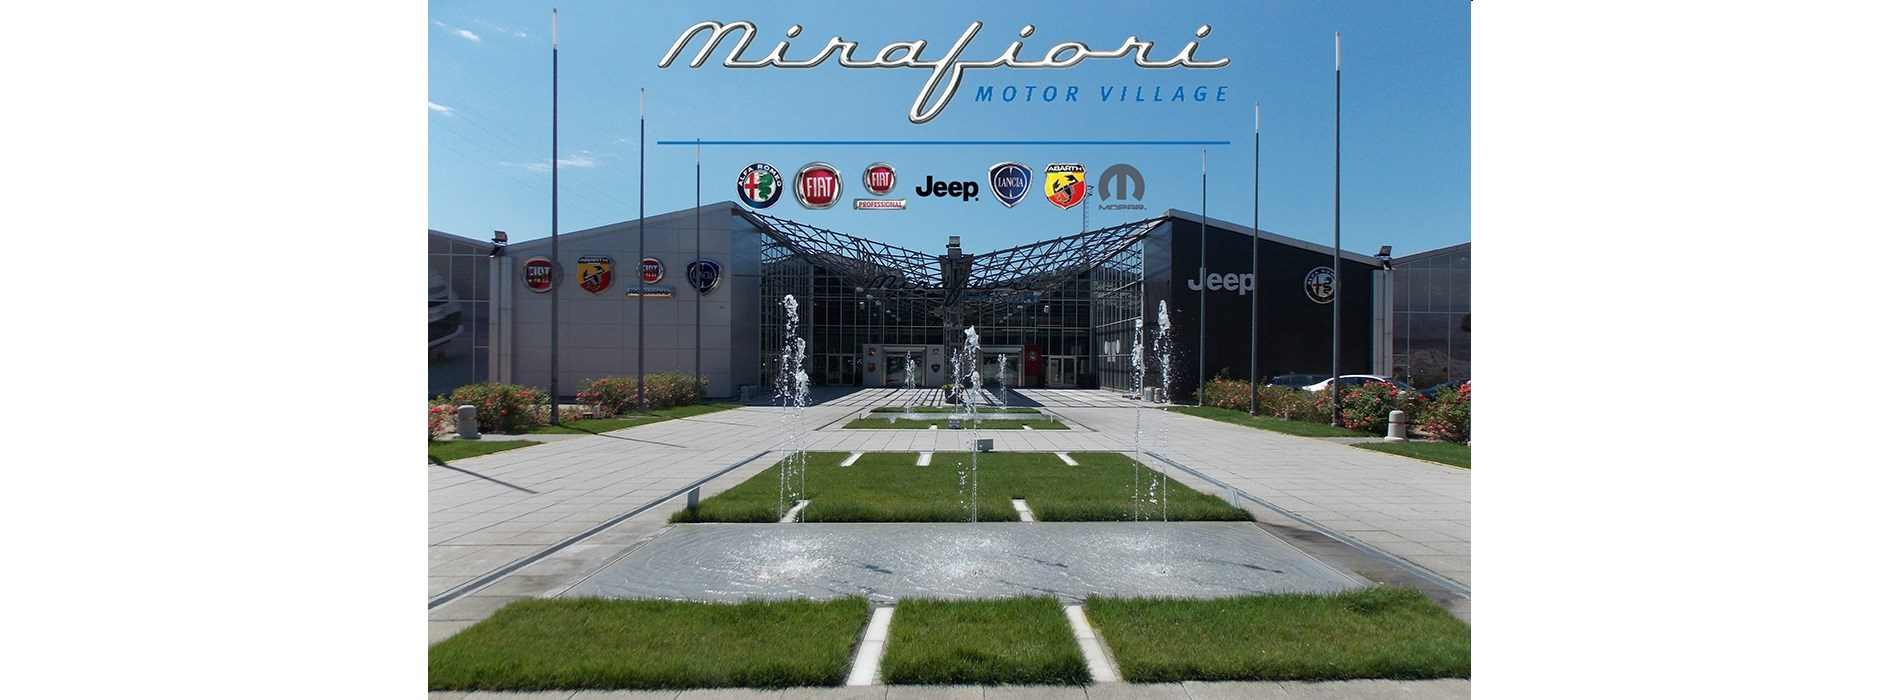 mirafiori-motor-village-concessionaria